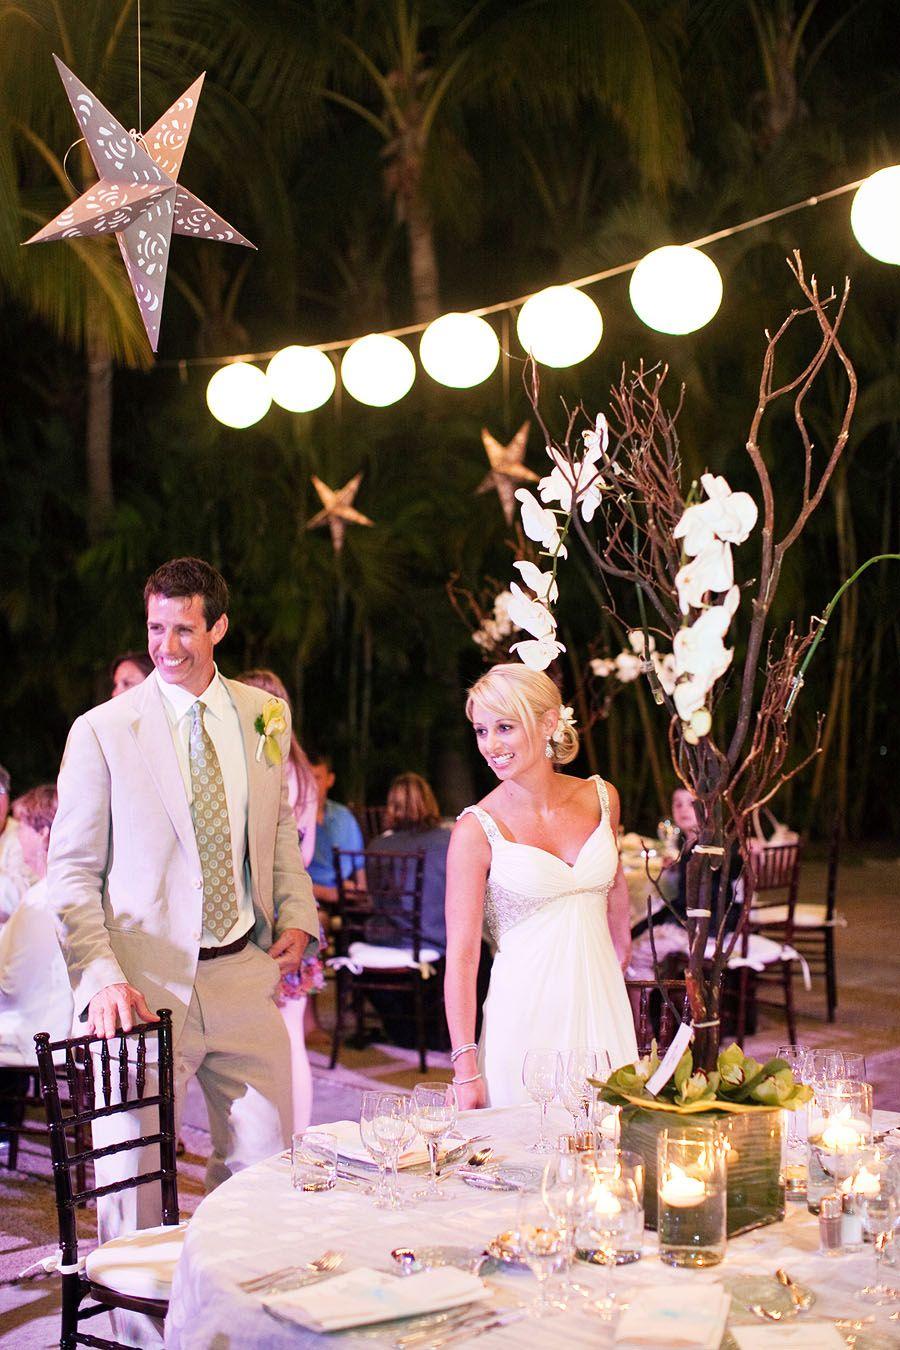 Punta Mita Wedding At The Four Seasons Reagan And Chris